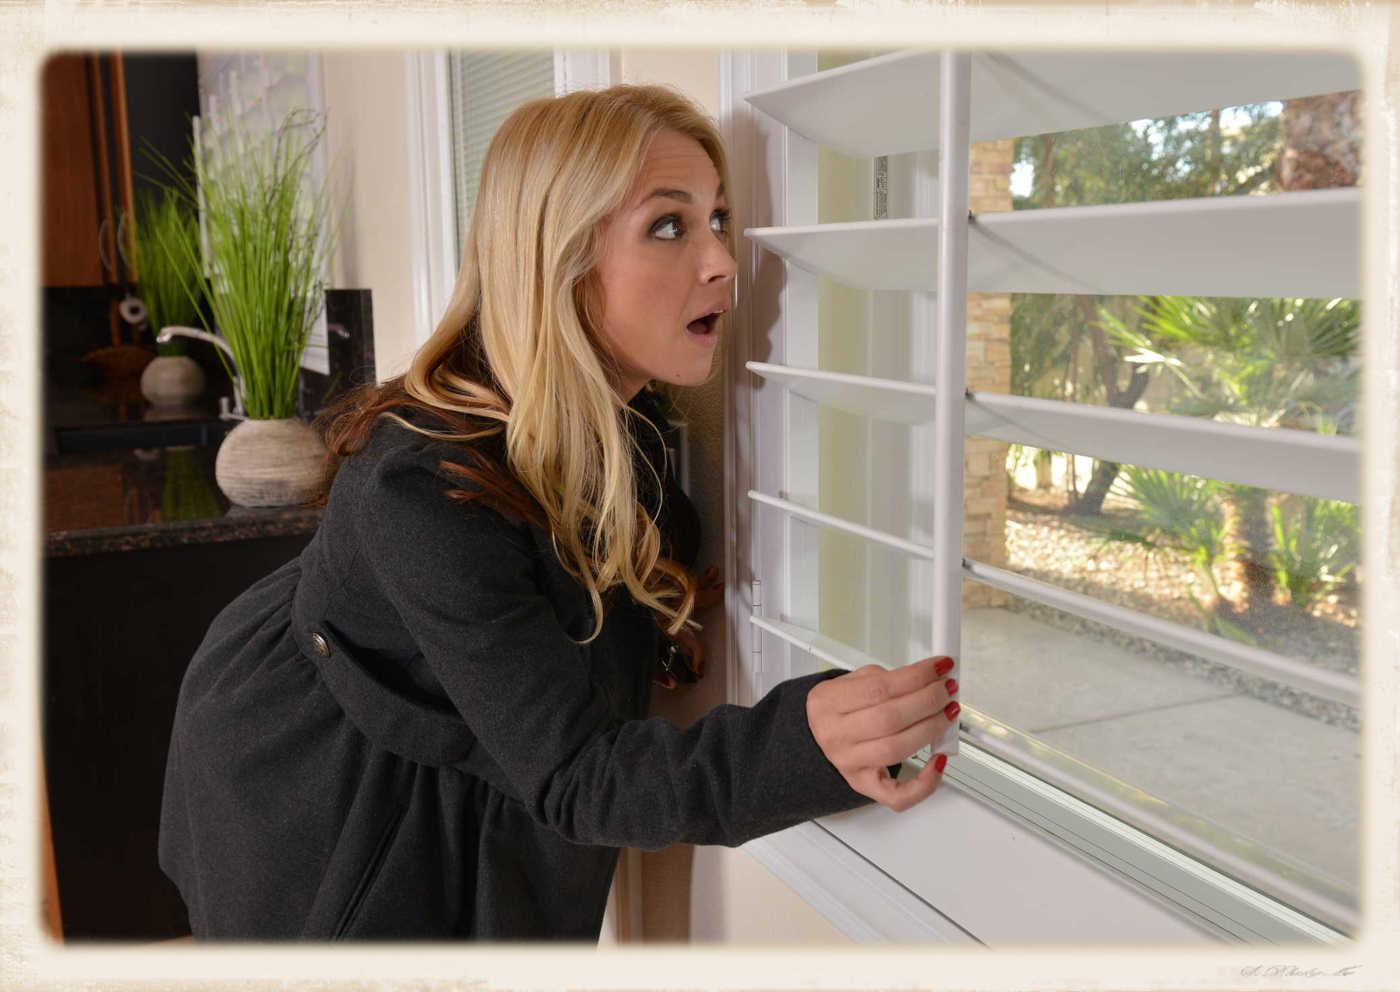 Sarah Vandella peeking